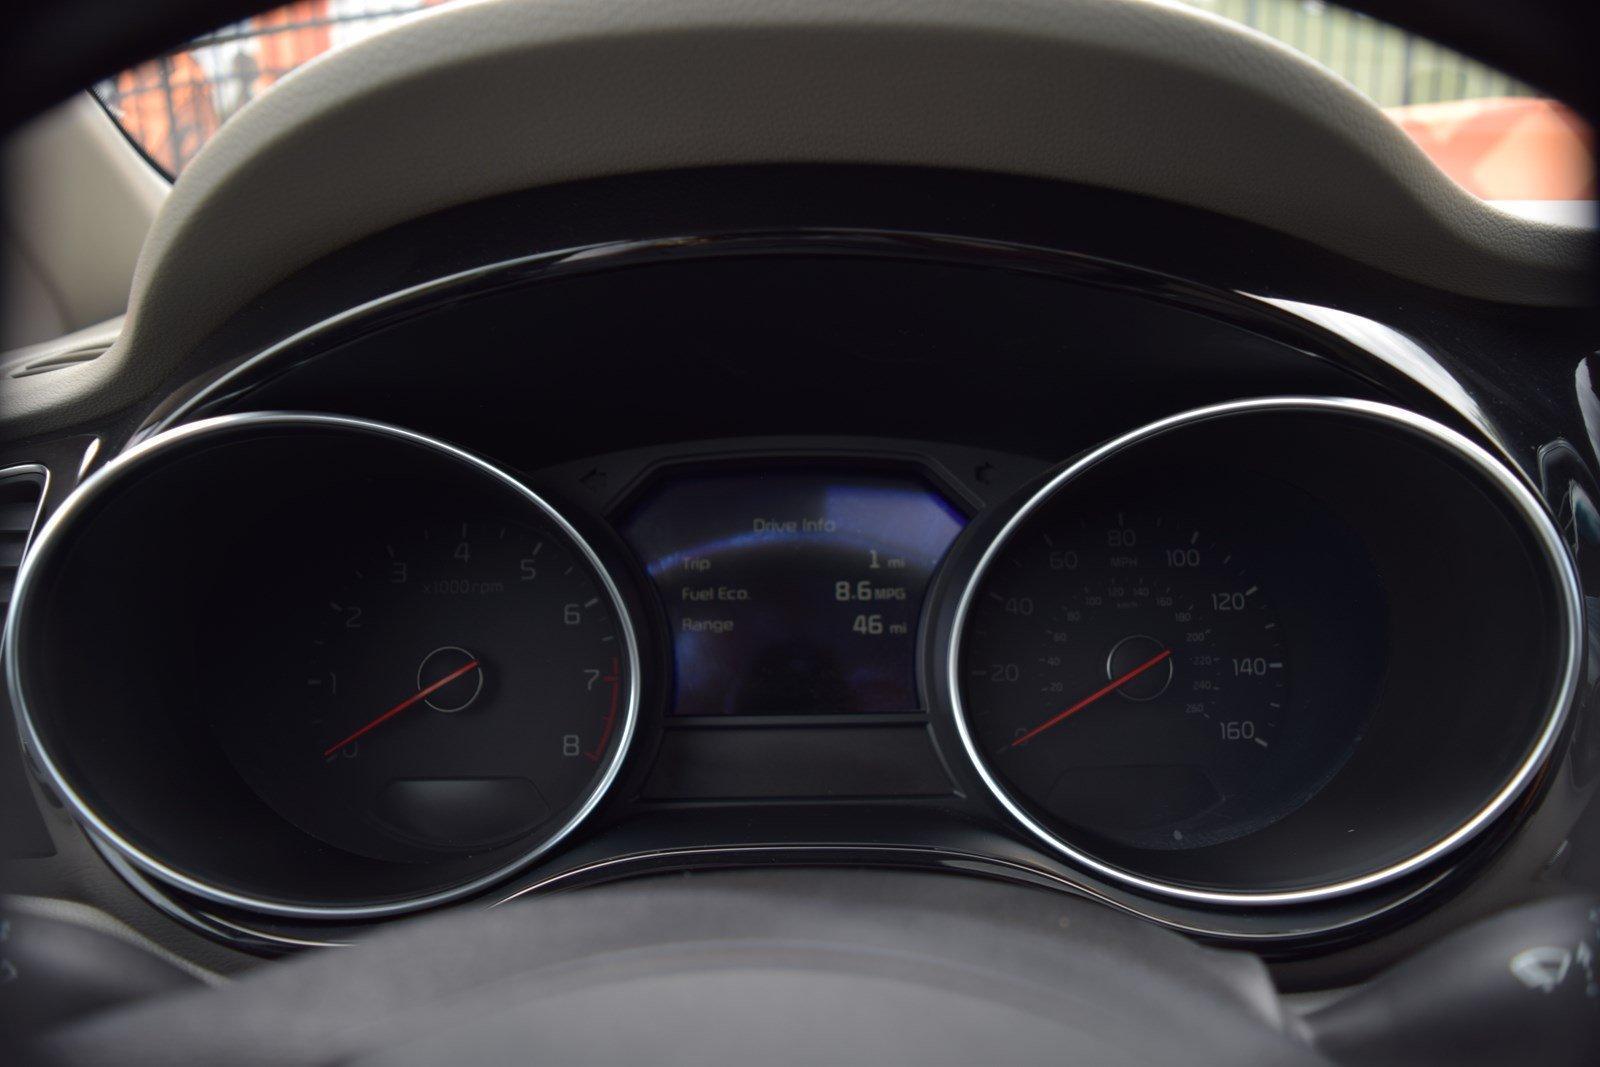 2015 Kia Sedona Sx L Stock 027193 For Sale Near Sandy Springs Ga Gauges Used